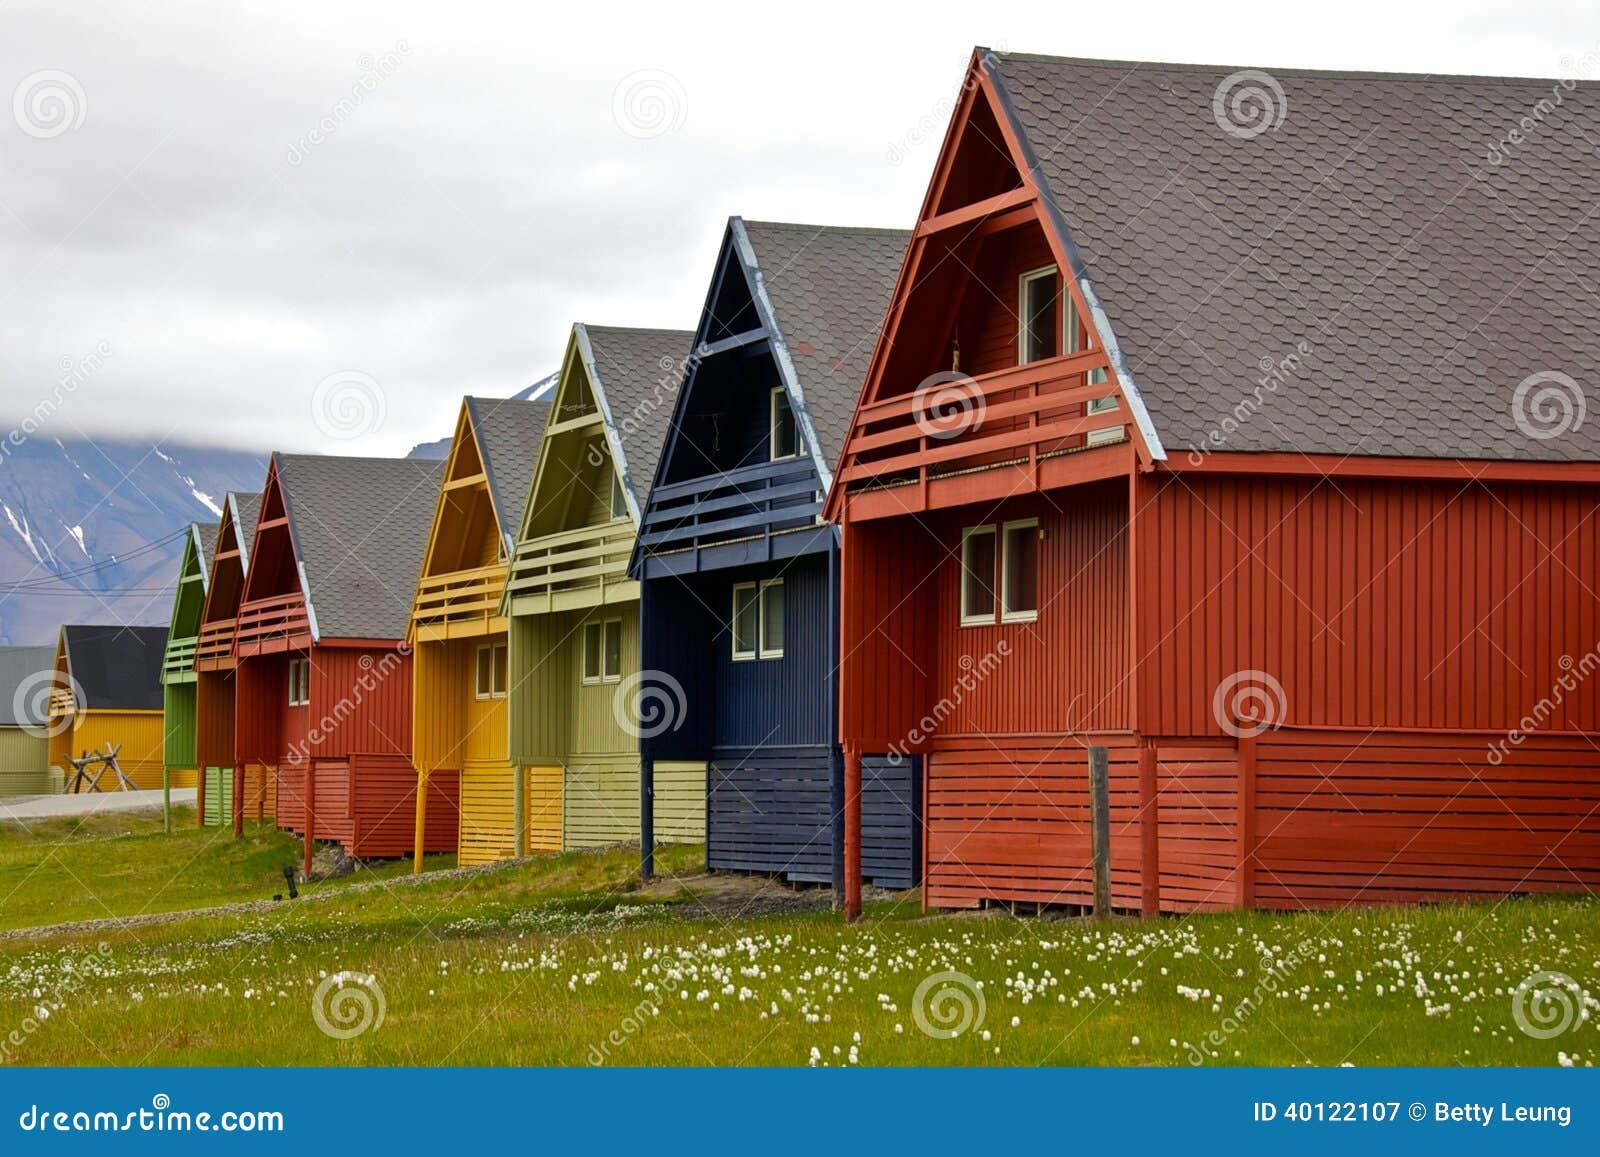 eihe Von Bunten Häusern In Longyearbyen, Svalbard Stockfoto ... size: 1300 x 957 post ID: 8 File size: 0 B